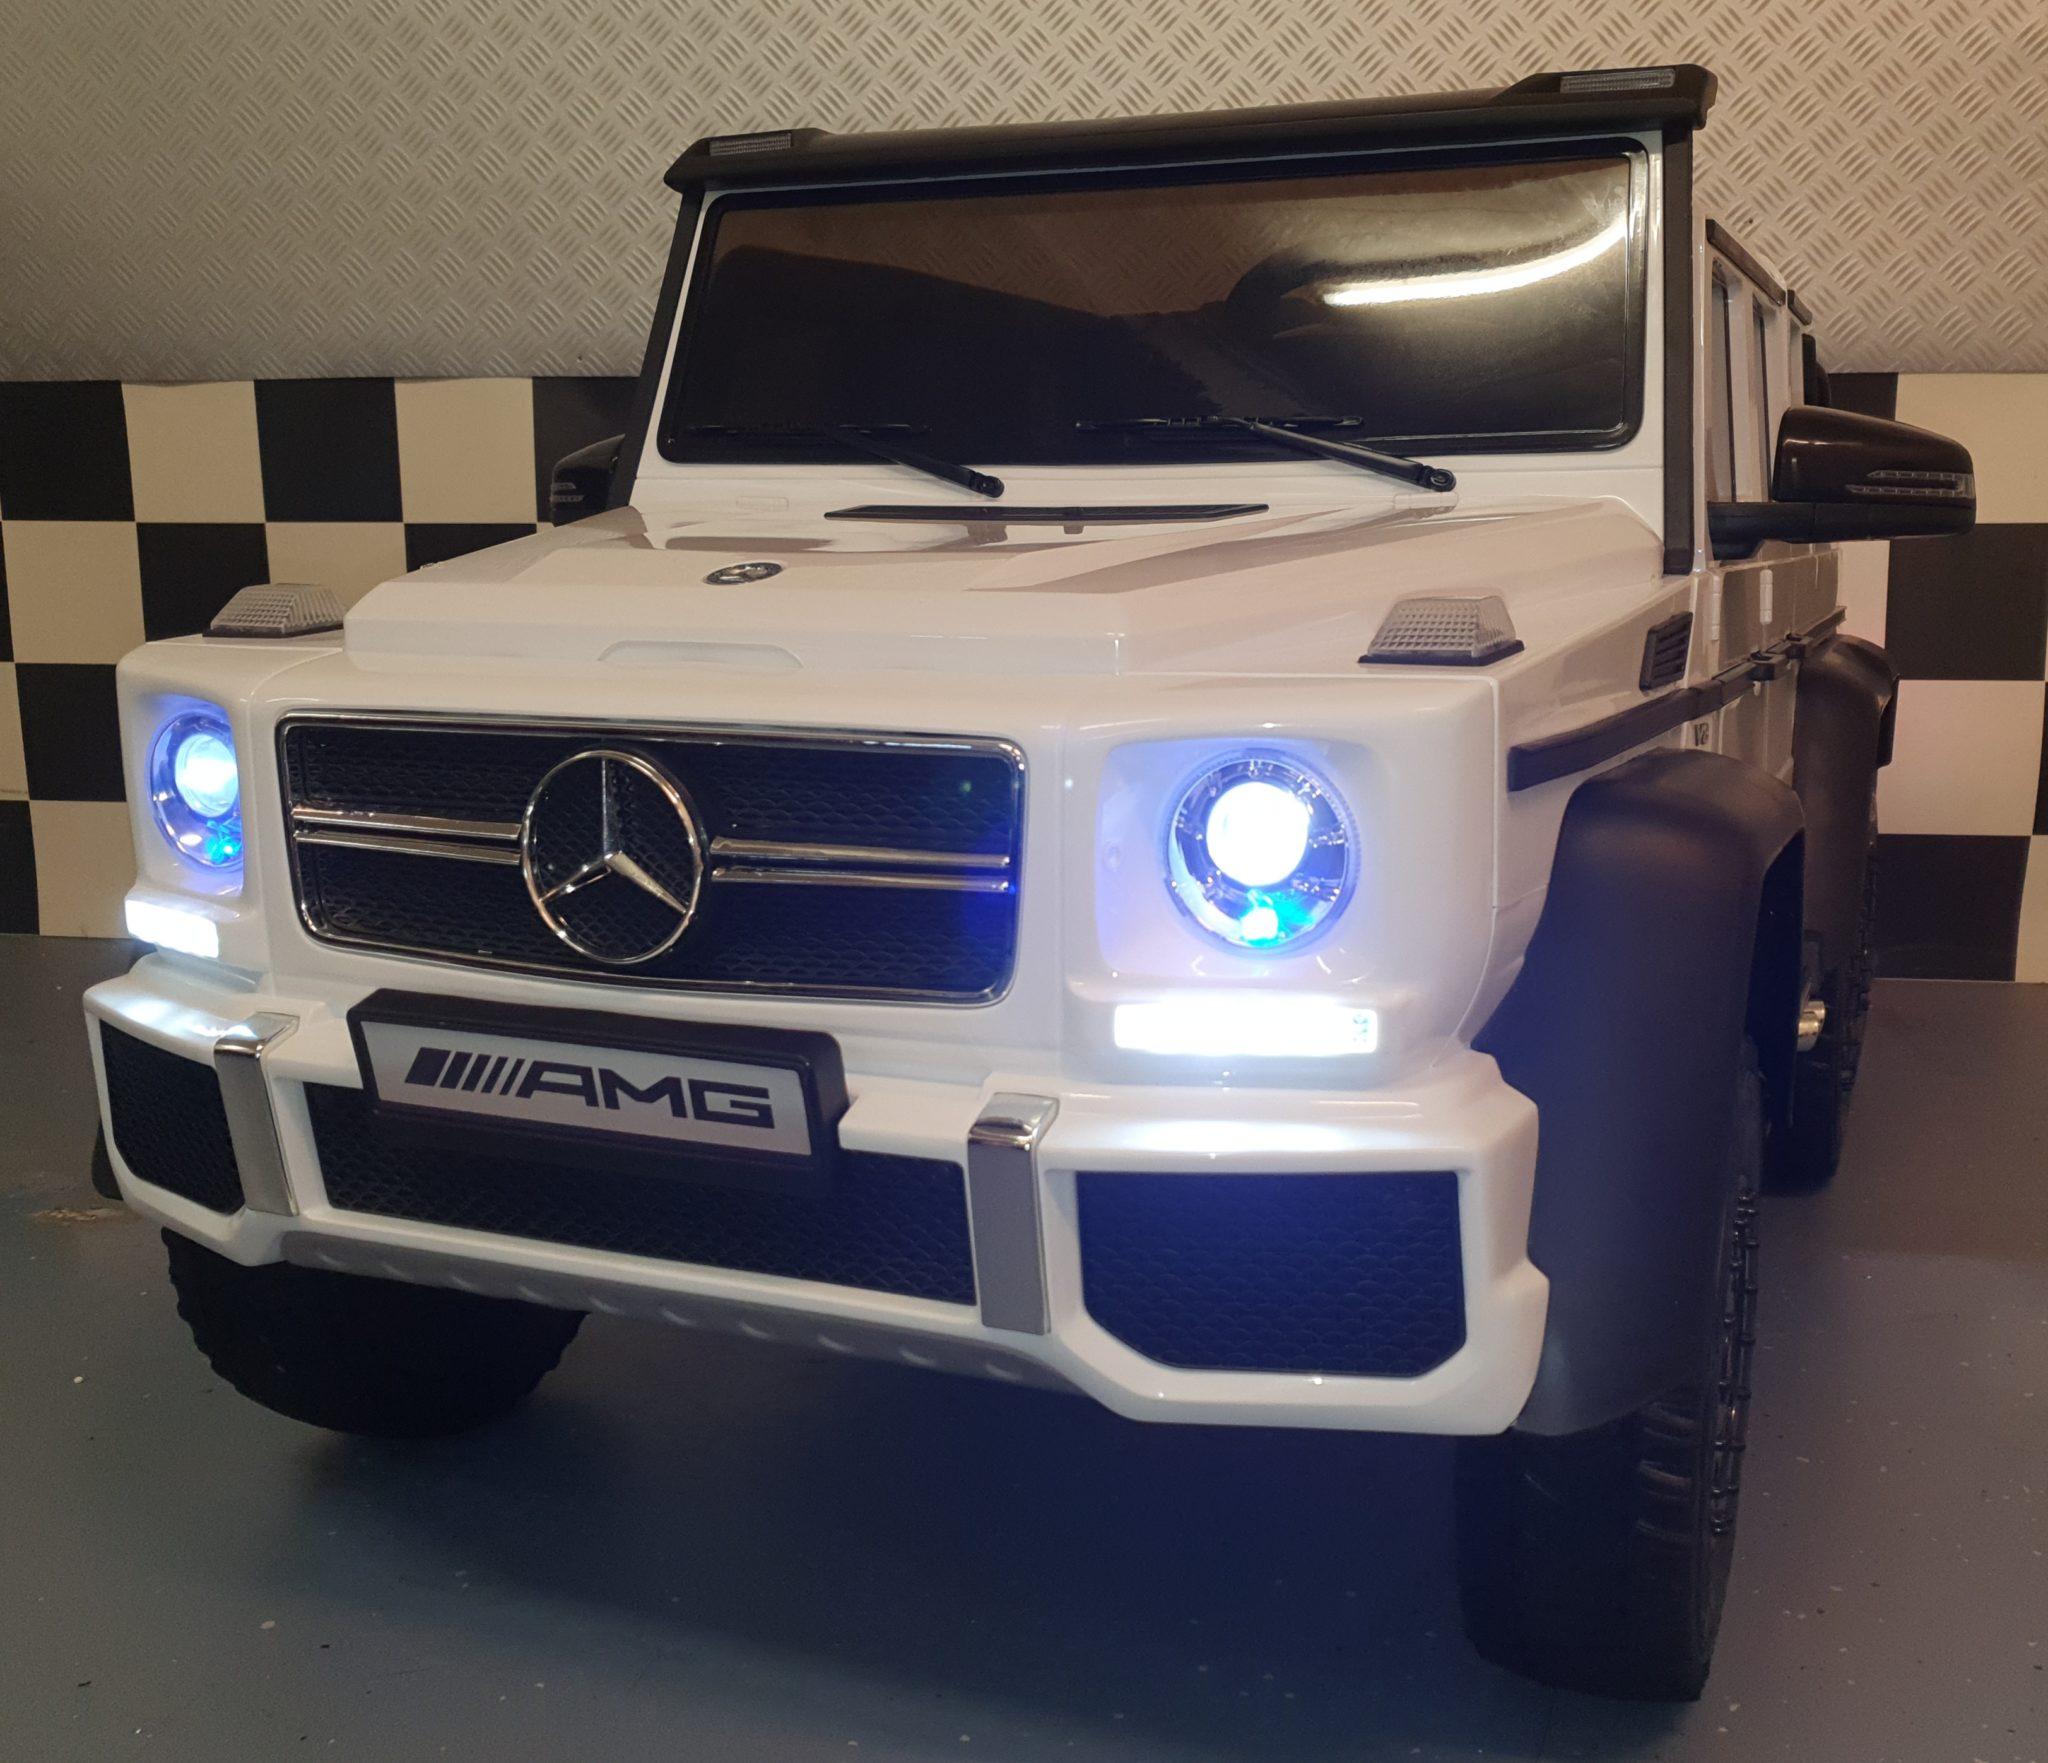 2 zits kinderauto Mercedes 6×6 AMG 2.4G RC 12V wit